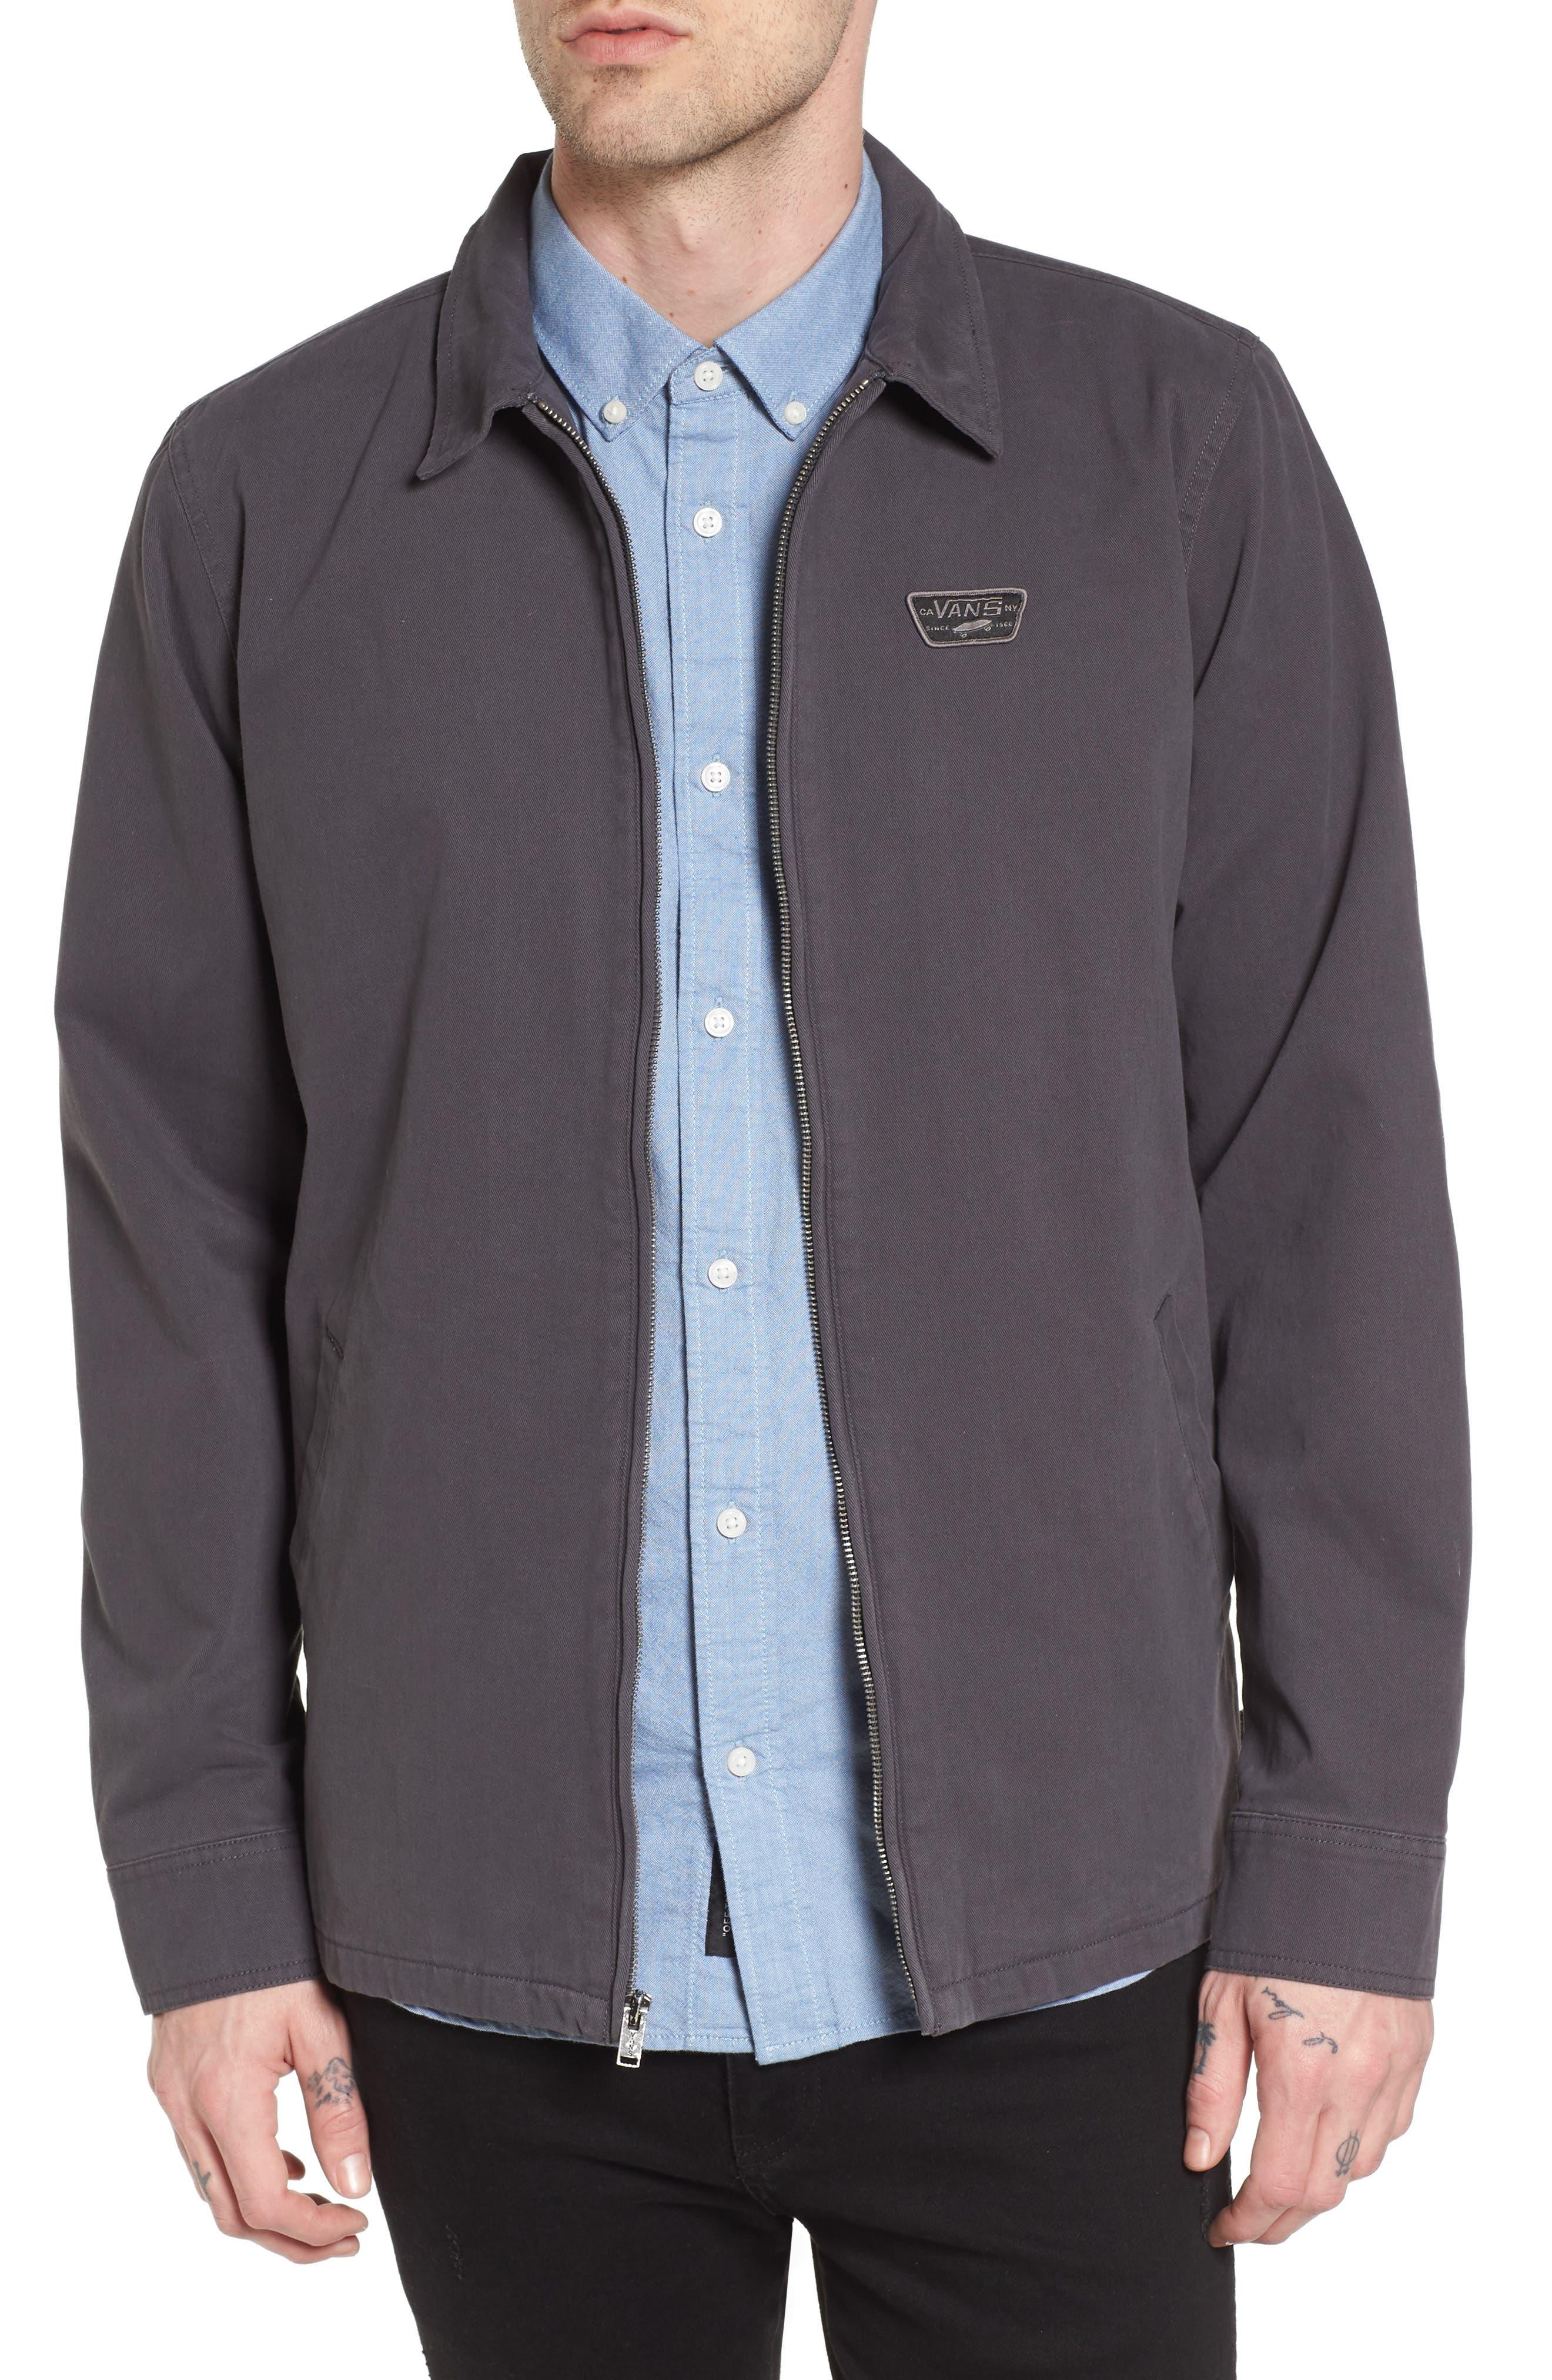 Belfair II Garage Jacket,                             Main thumbnail 1, color,                             Asphalt